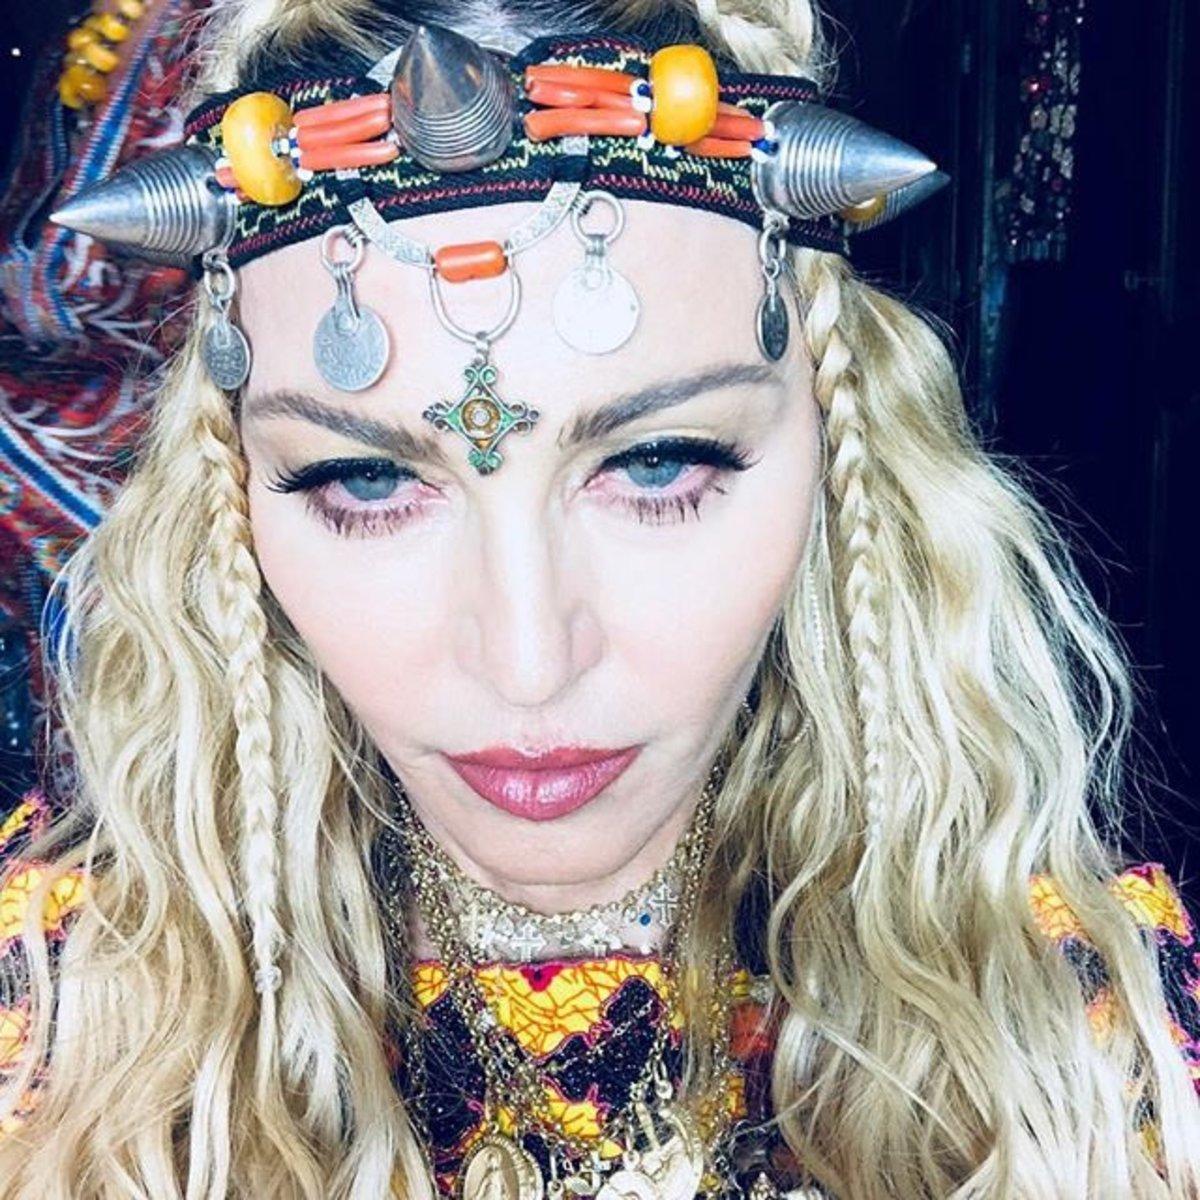 Happy Birthday Madonna – Οι ευχές των διασήμων στη βασίλισσα της ποπ!